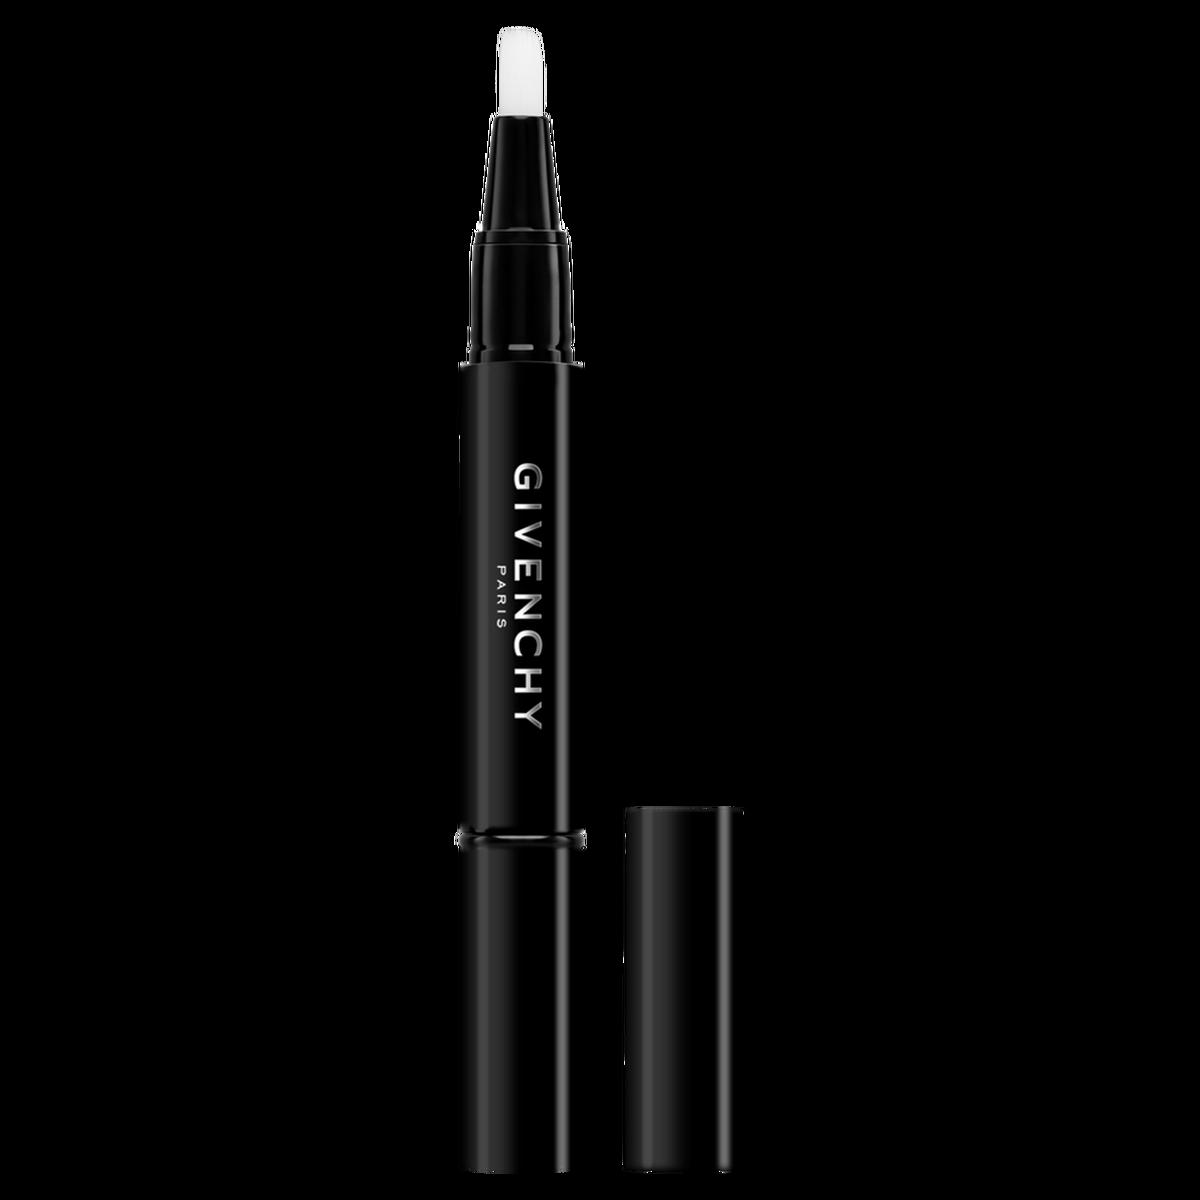 Givenchy Mister Light Instant Light Corrective Pencil